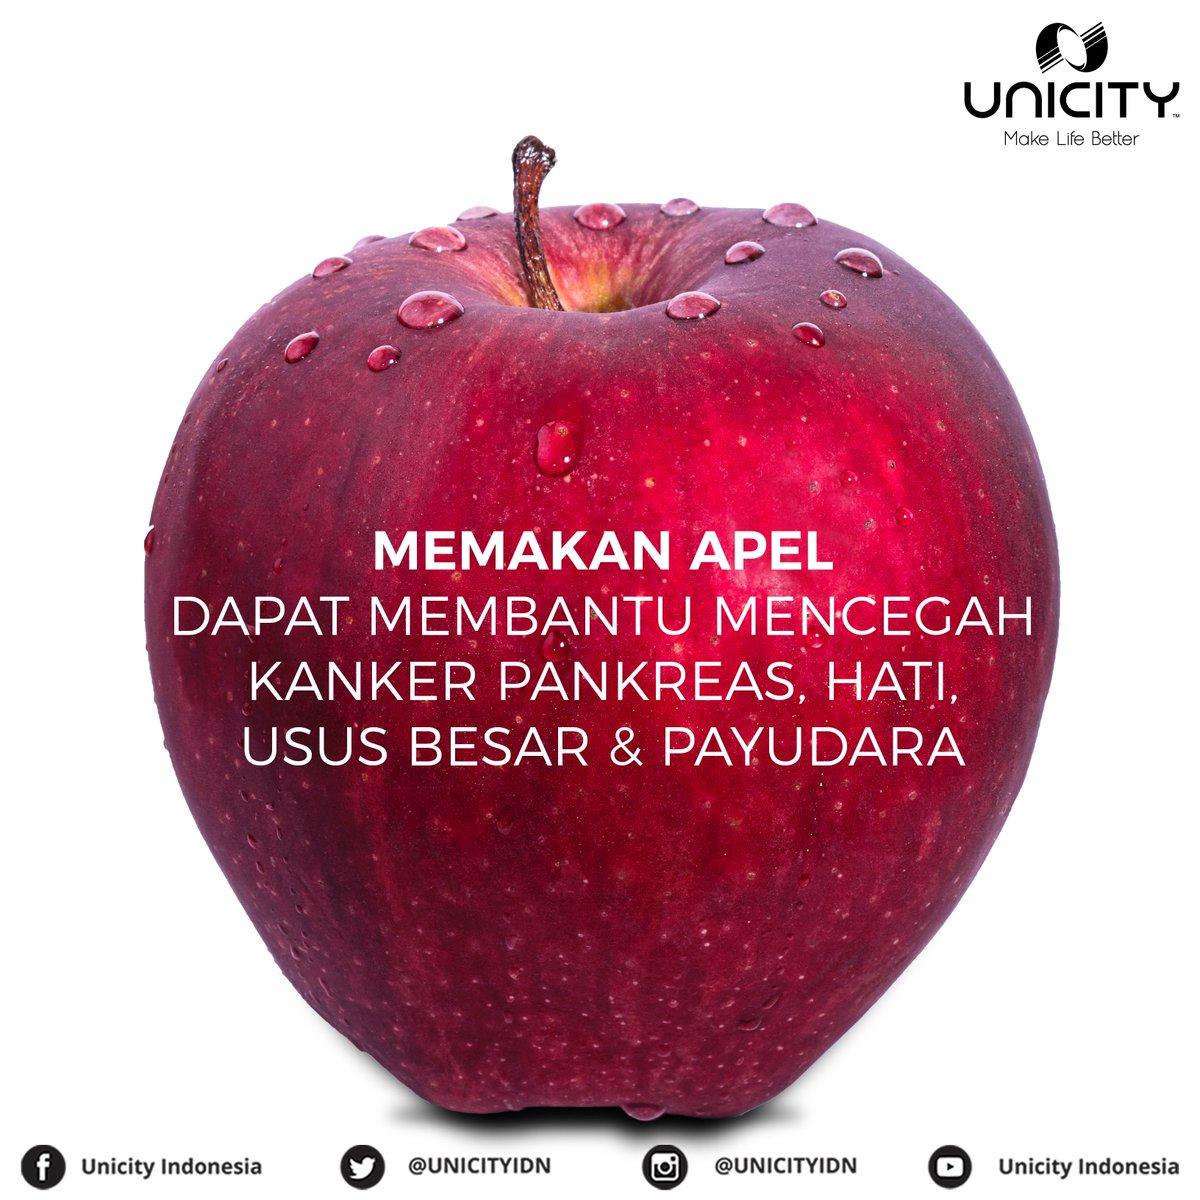 "Pasti sudah sering denger ""an apple a day keep the doctor away?"" Kulit Apel mengandung triterpenoids yang dapat memicu maspin, senyawa protein yang dapat menekan pertumbuhan kanker.  #manfaatbuah #apel #manfaatapel #apple #healthyfood #buah #fruits #healthyfruits #Cancer"